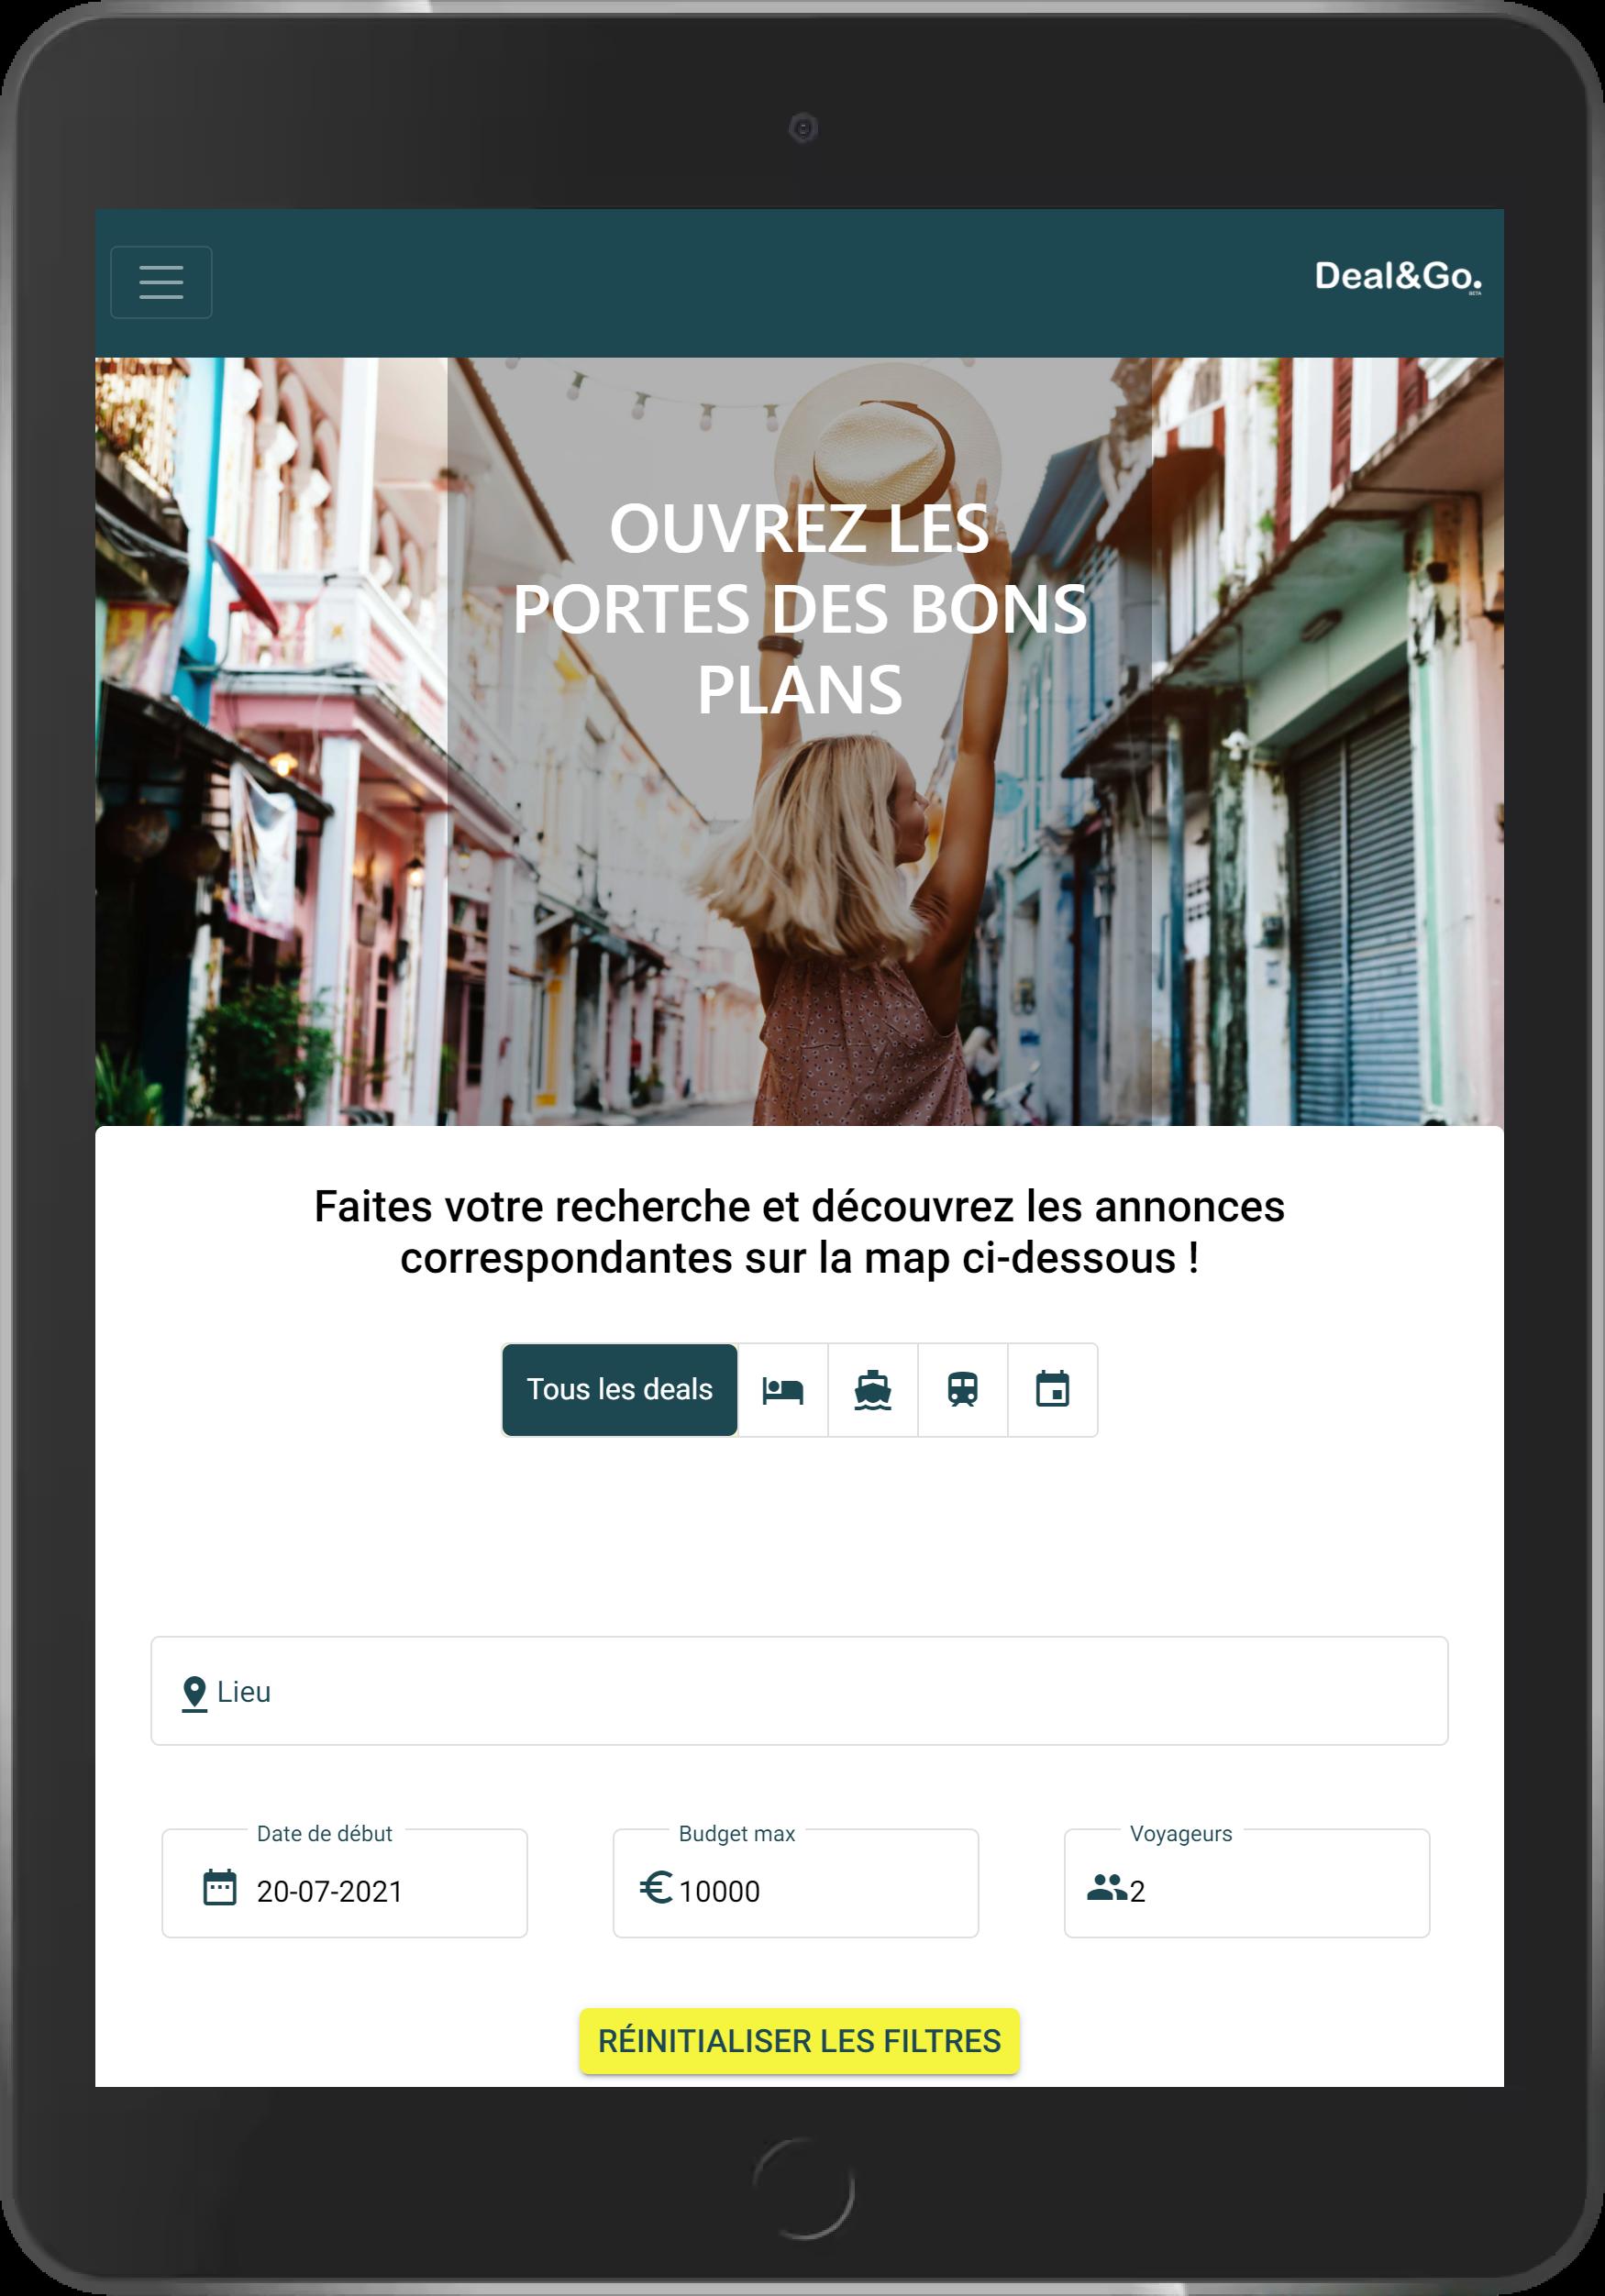 page accueil dealandgo.fr, plateforme collaborative